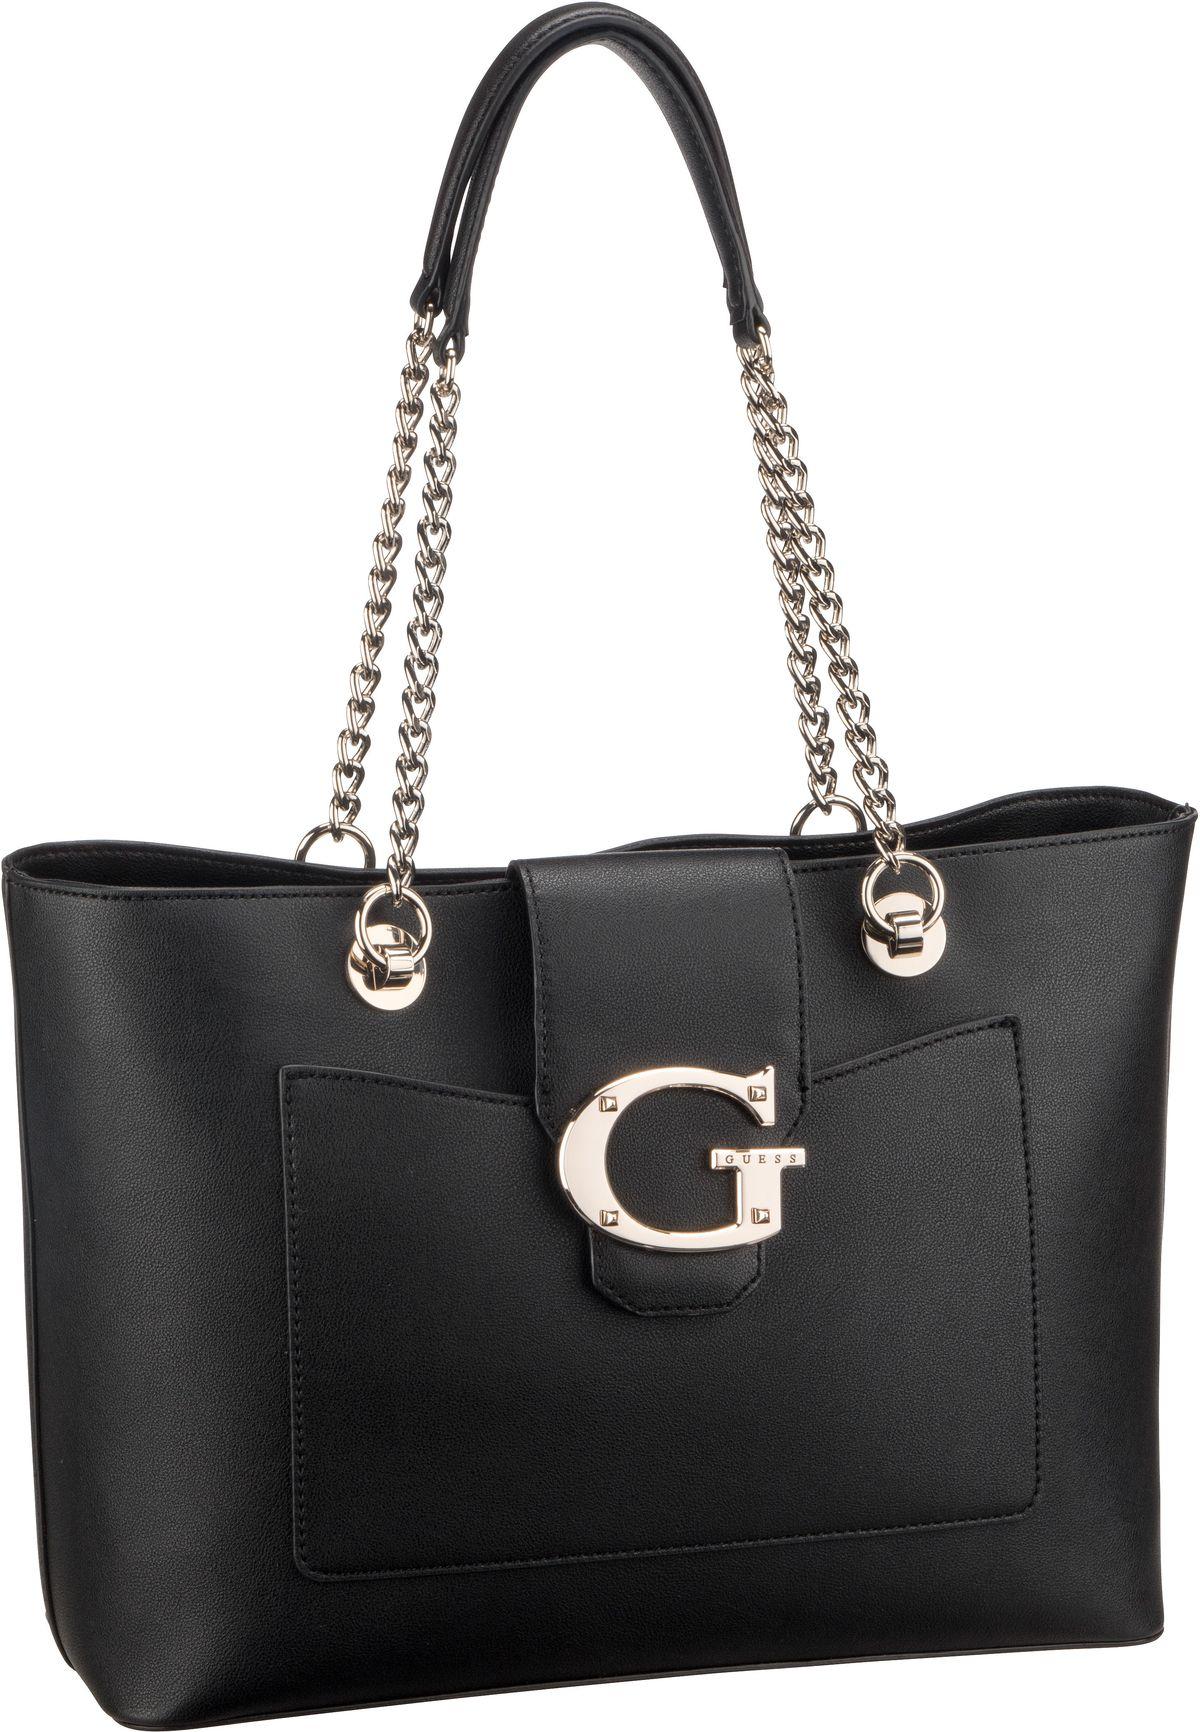 Handtasche Camila Tote Black